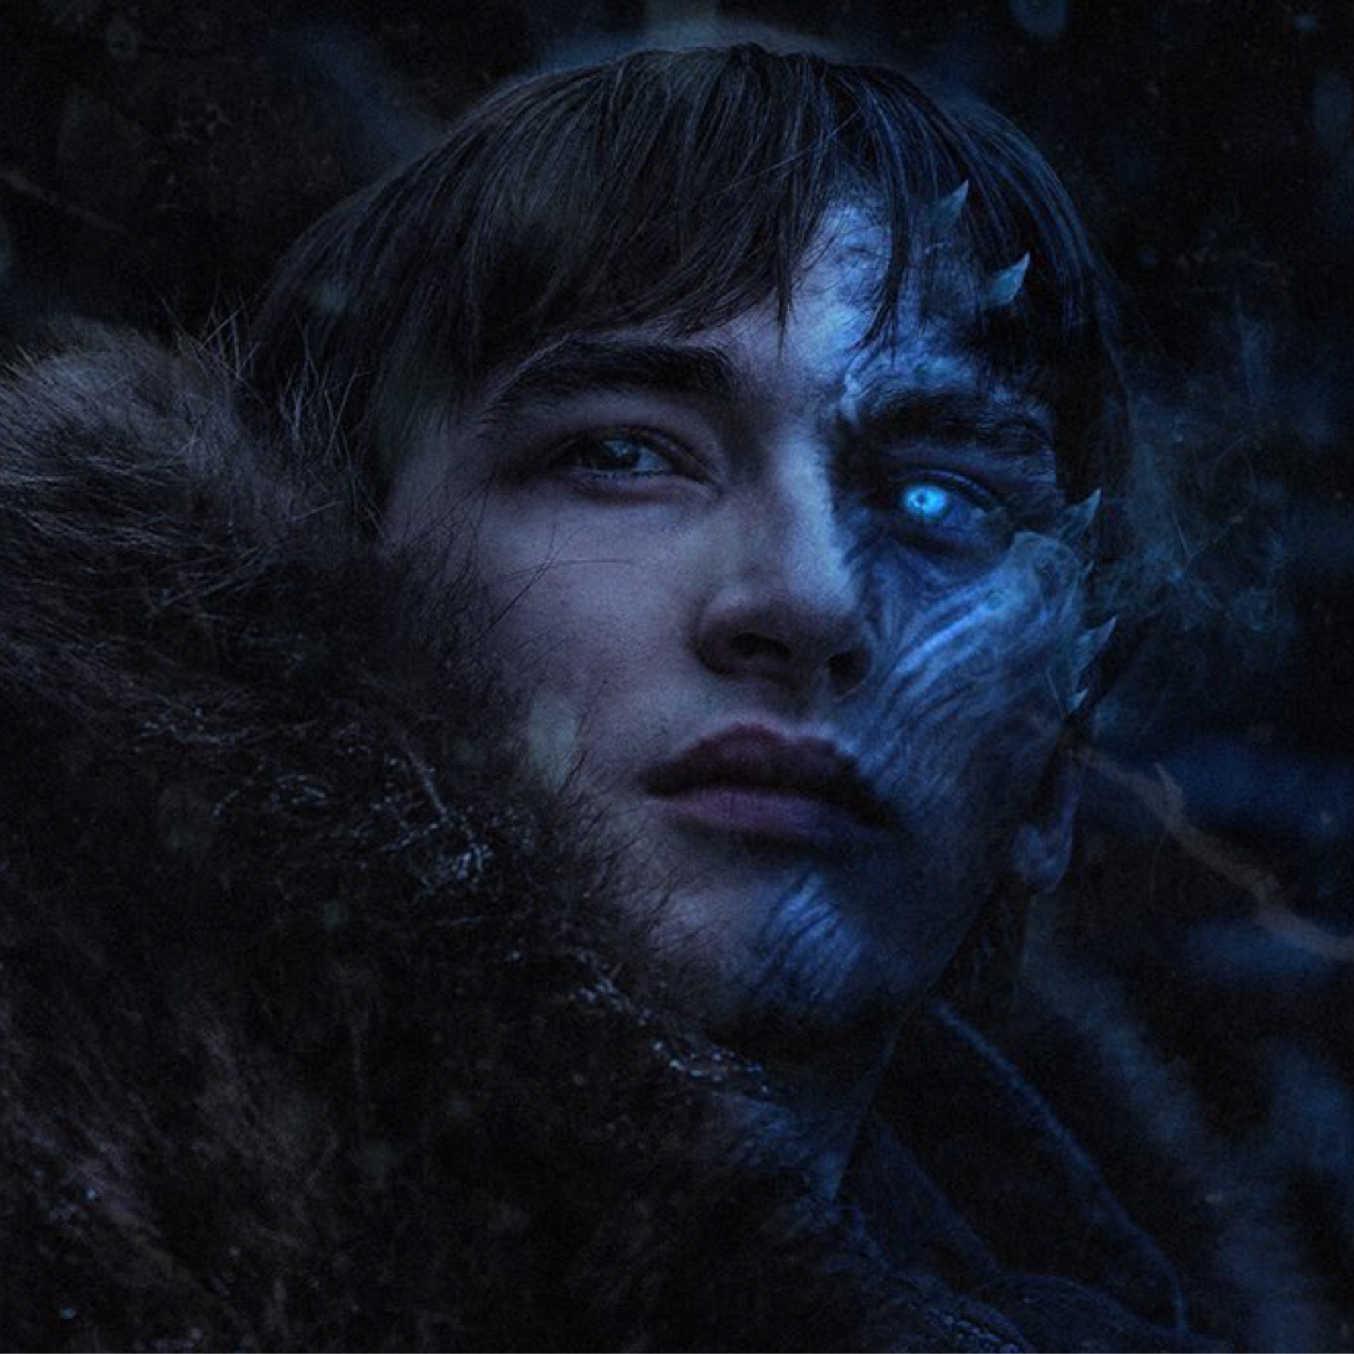 🖤 Bran Stark 🖤